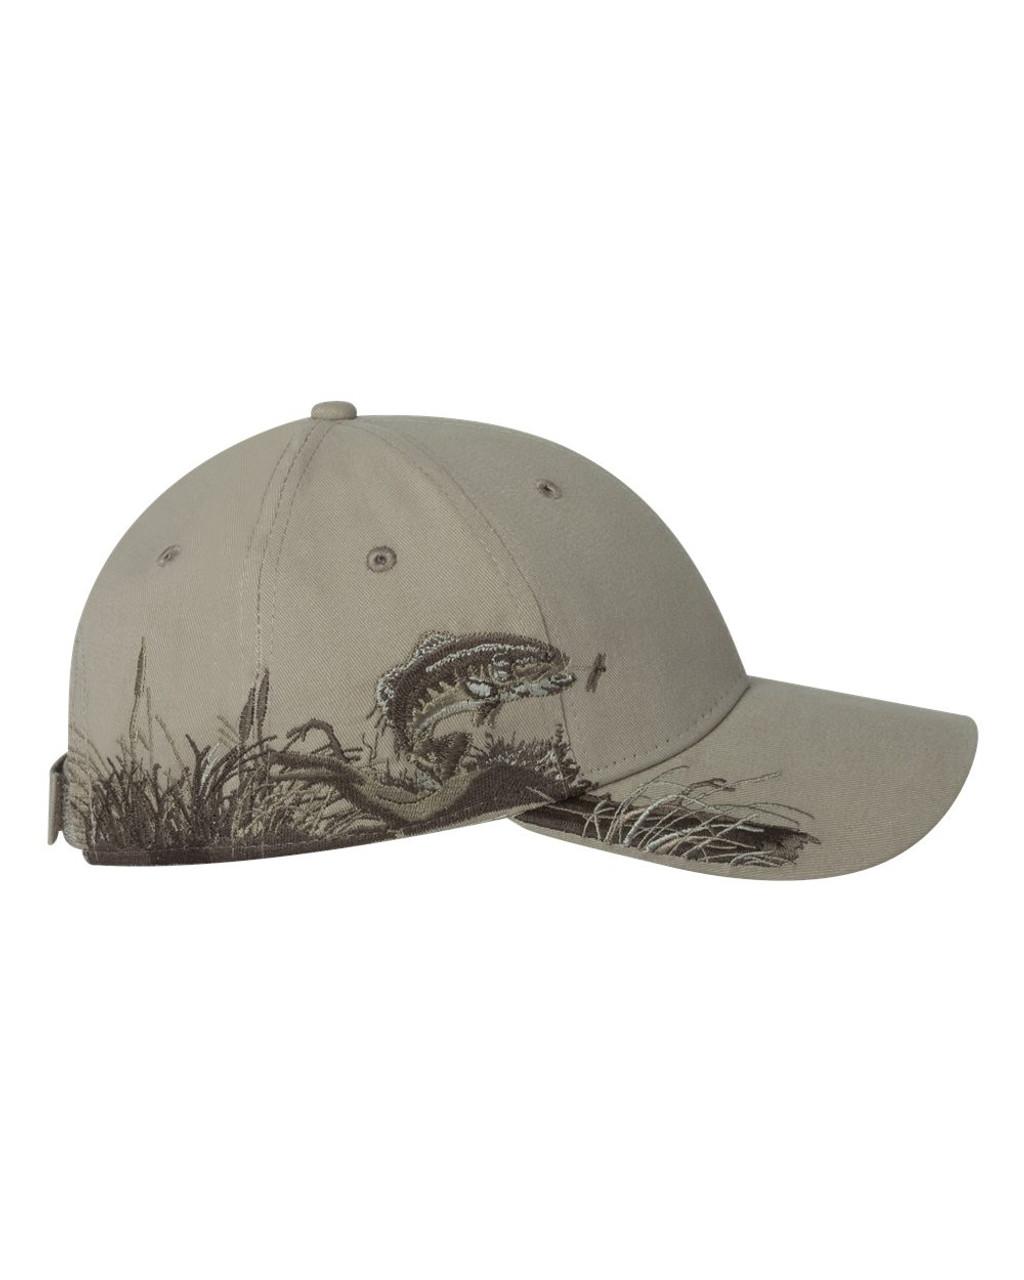 18425ff234 Dri Duck Trout Fishing Hunting Cap - B   R Embroidery